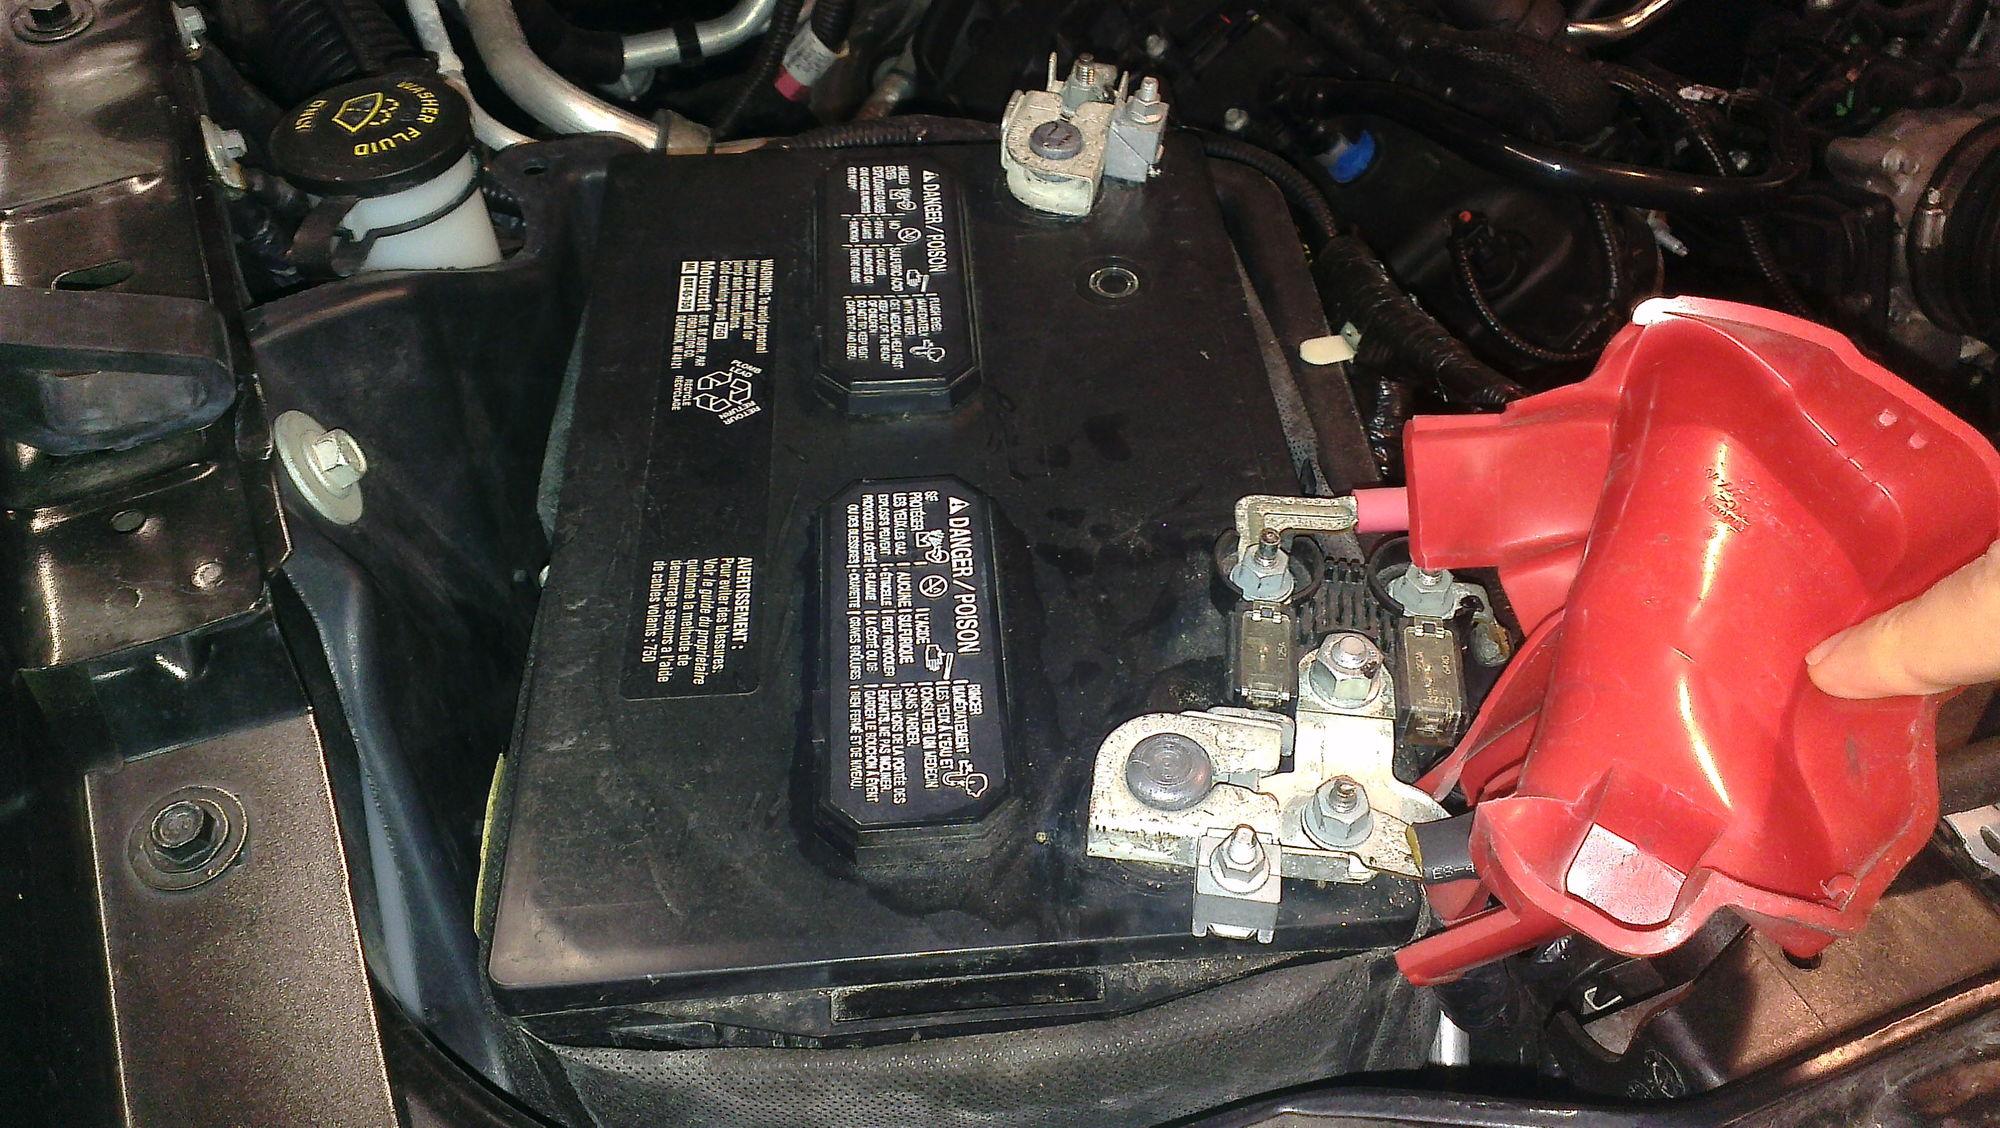 2013 Xlt Changing Battery Any Gotcha S Ford F150